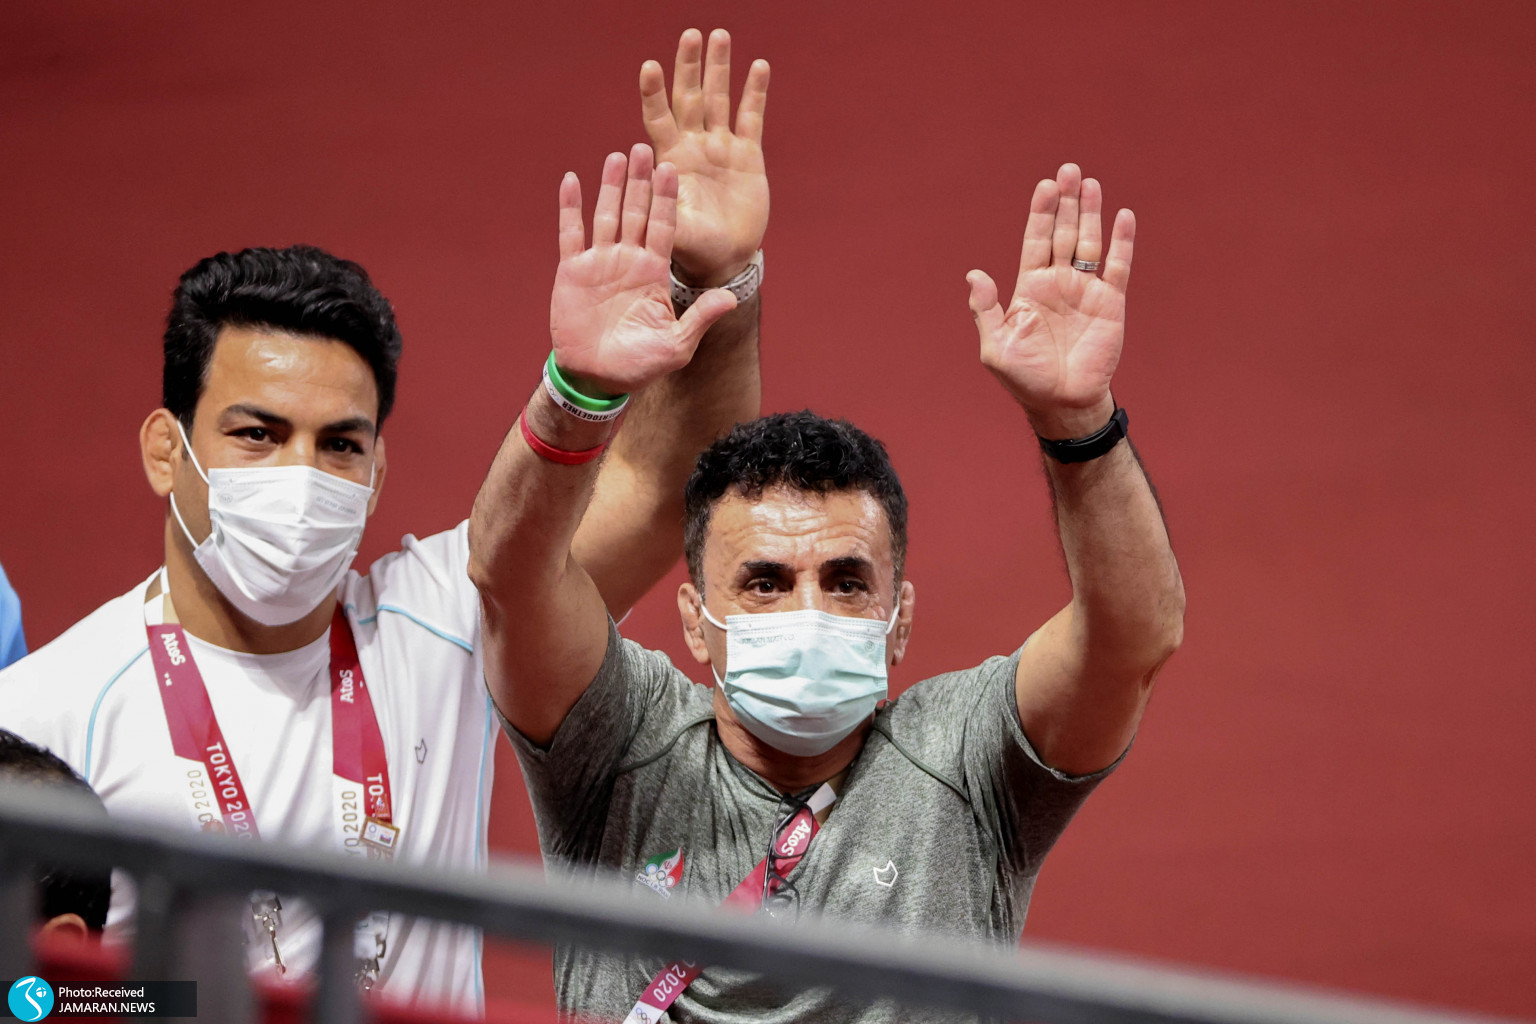 محمدهادی ساروی در کشتی فرنگی المپیک محمد بنا حبیب الله اخلاقی